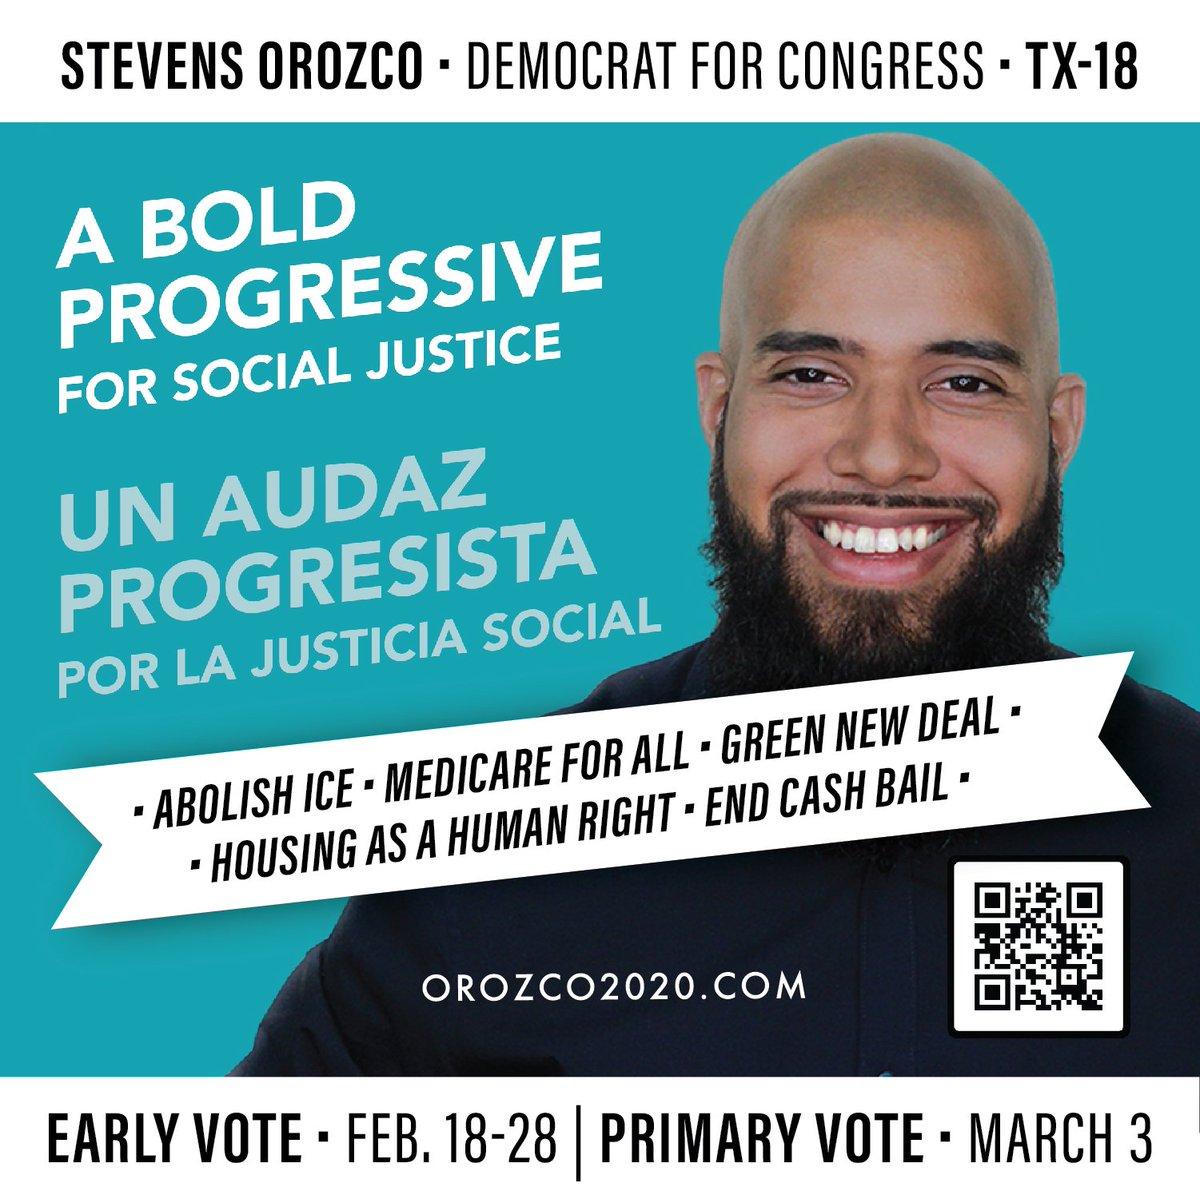 Stevens Orozco